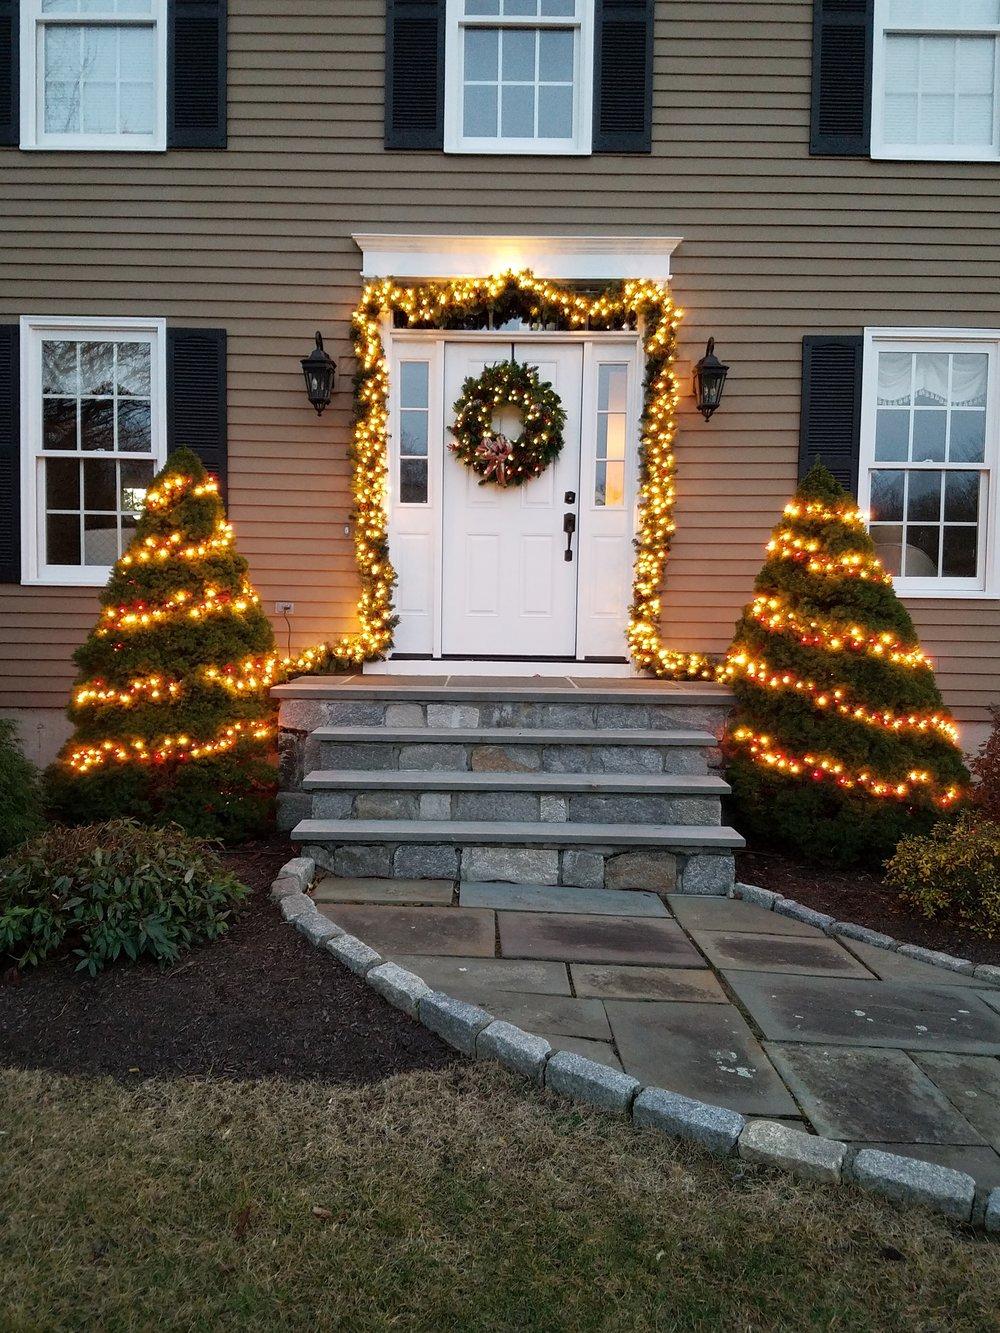 year round - Seasonal Displays